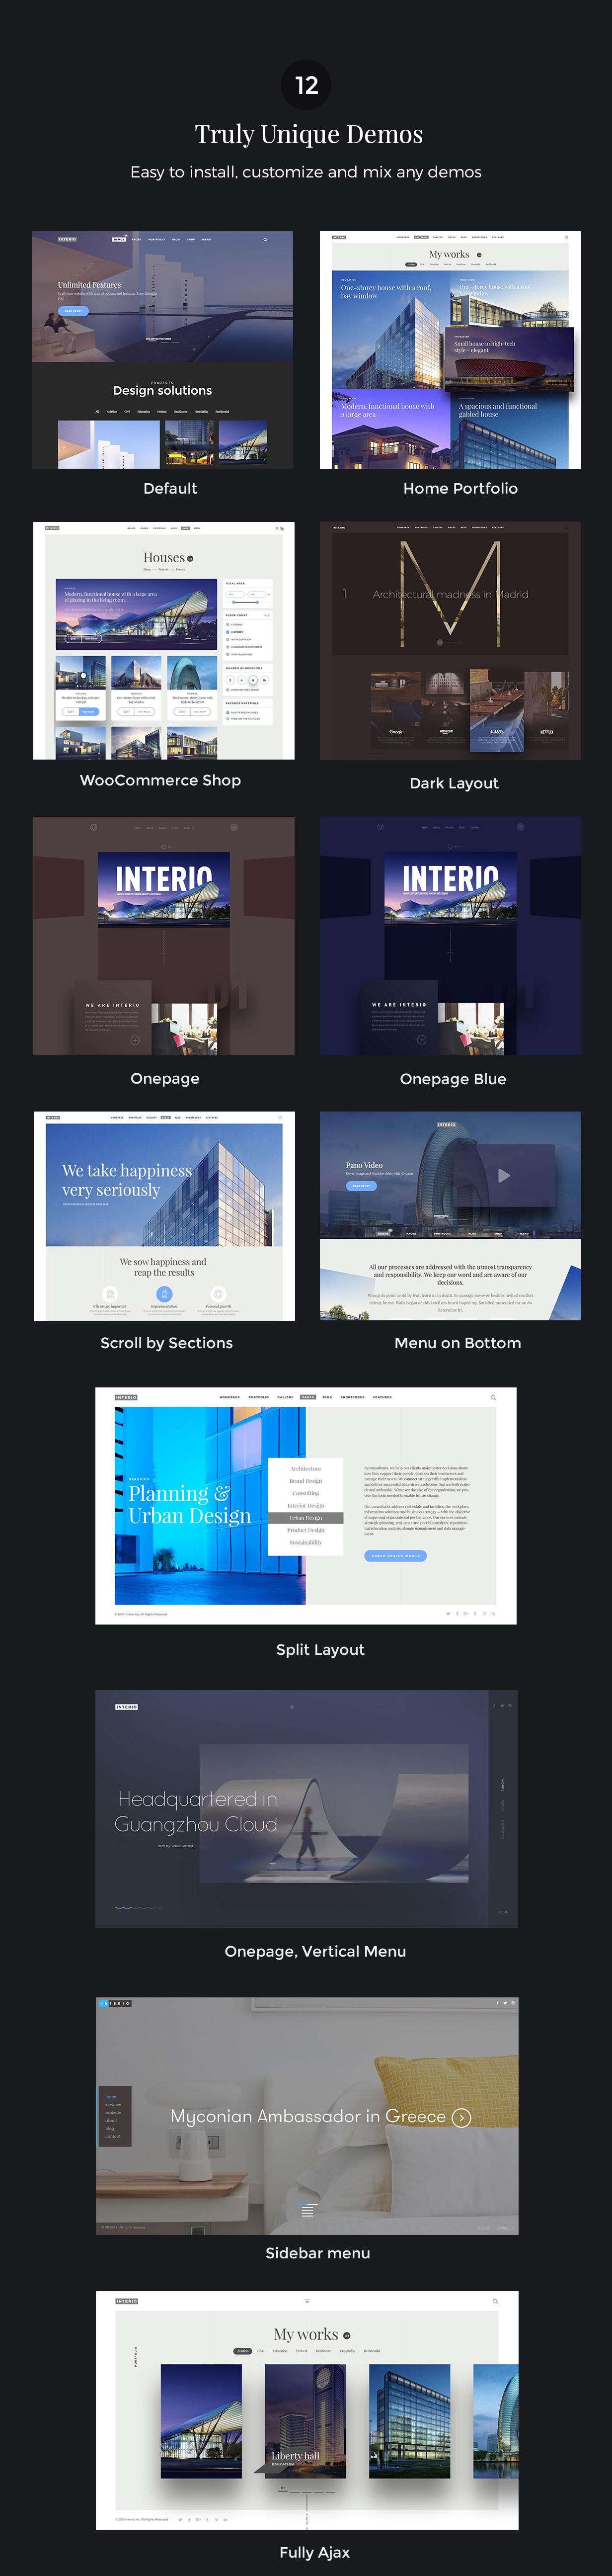 Interio | WordPress Architecture Theme - 4